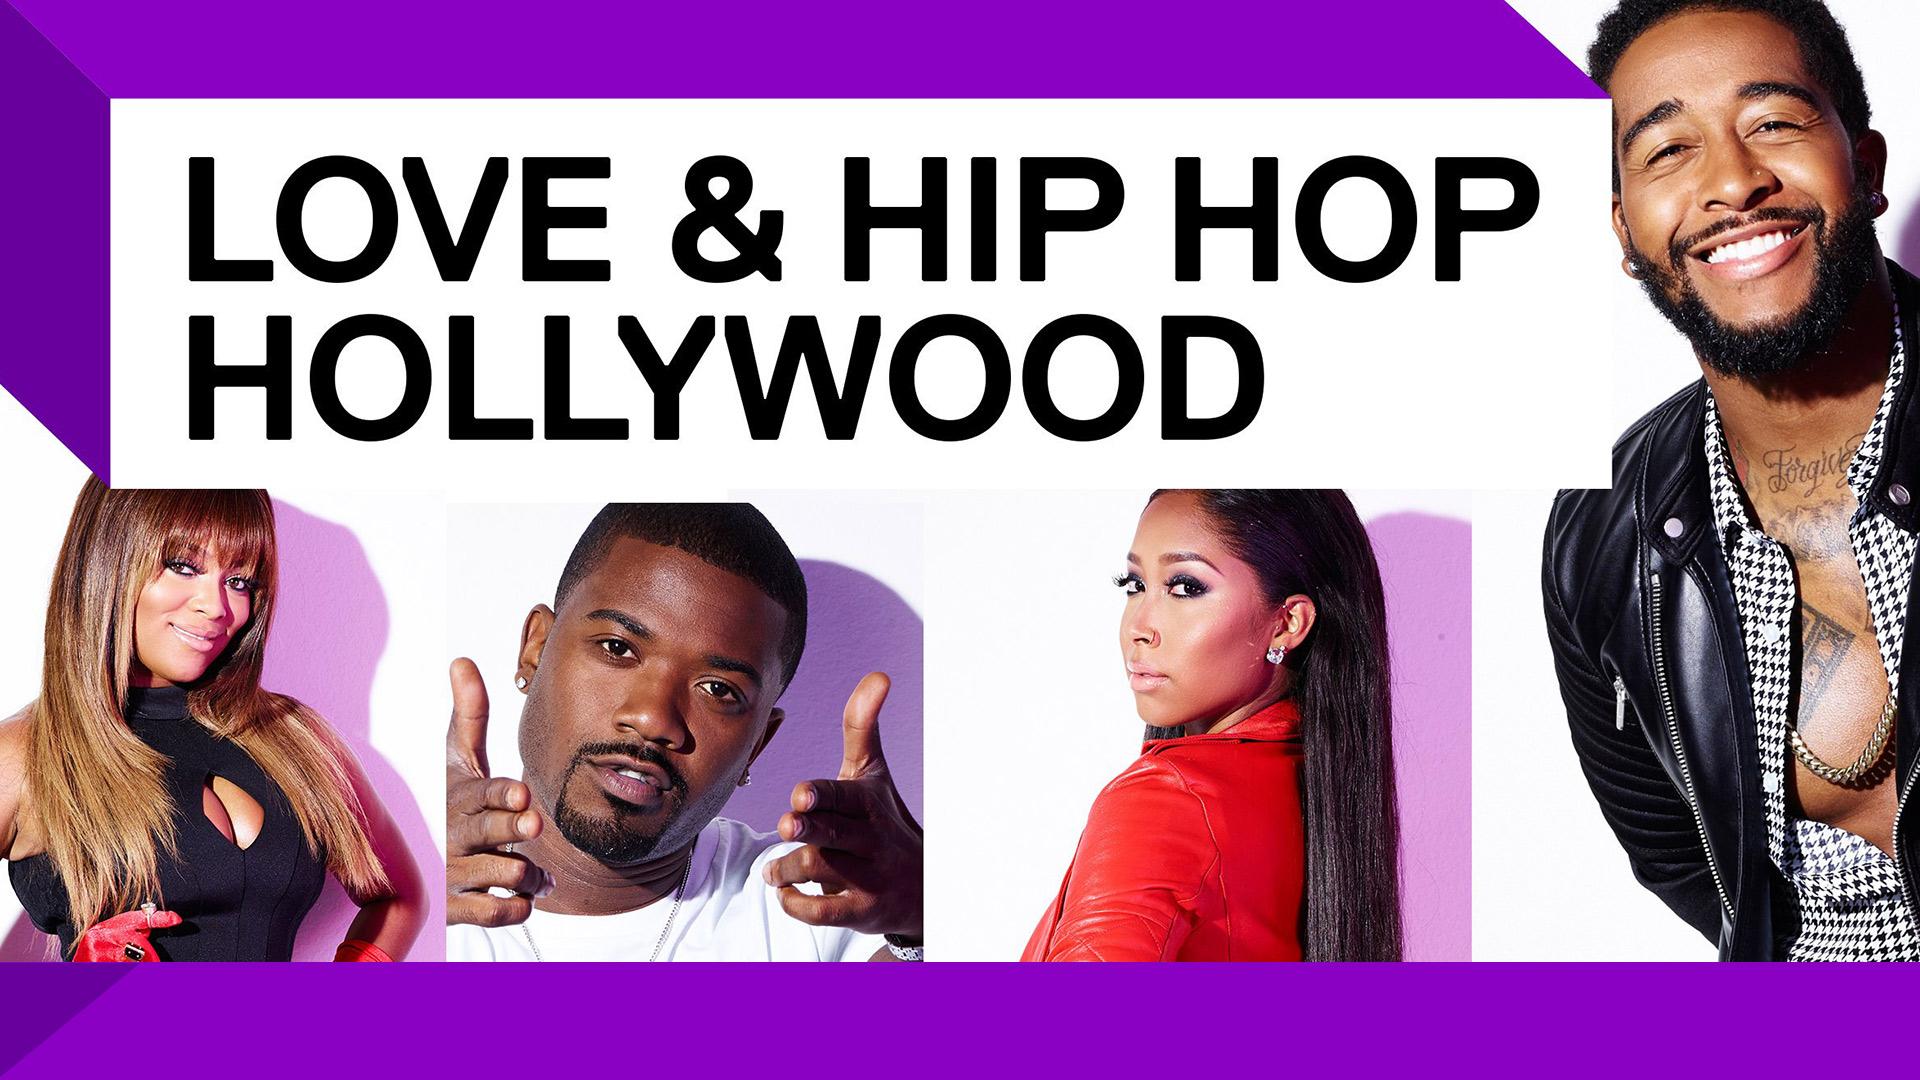 Love & Hip Hop Hollywood Season 1